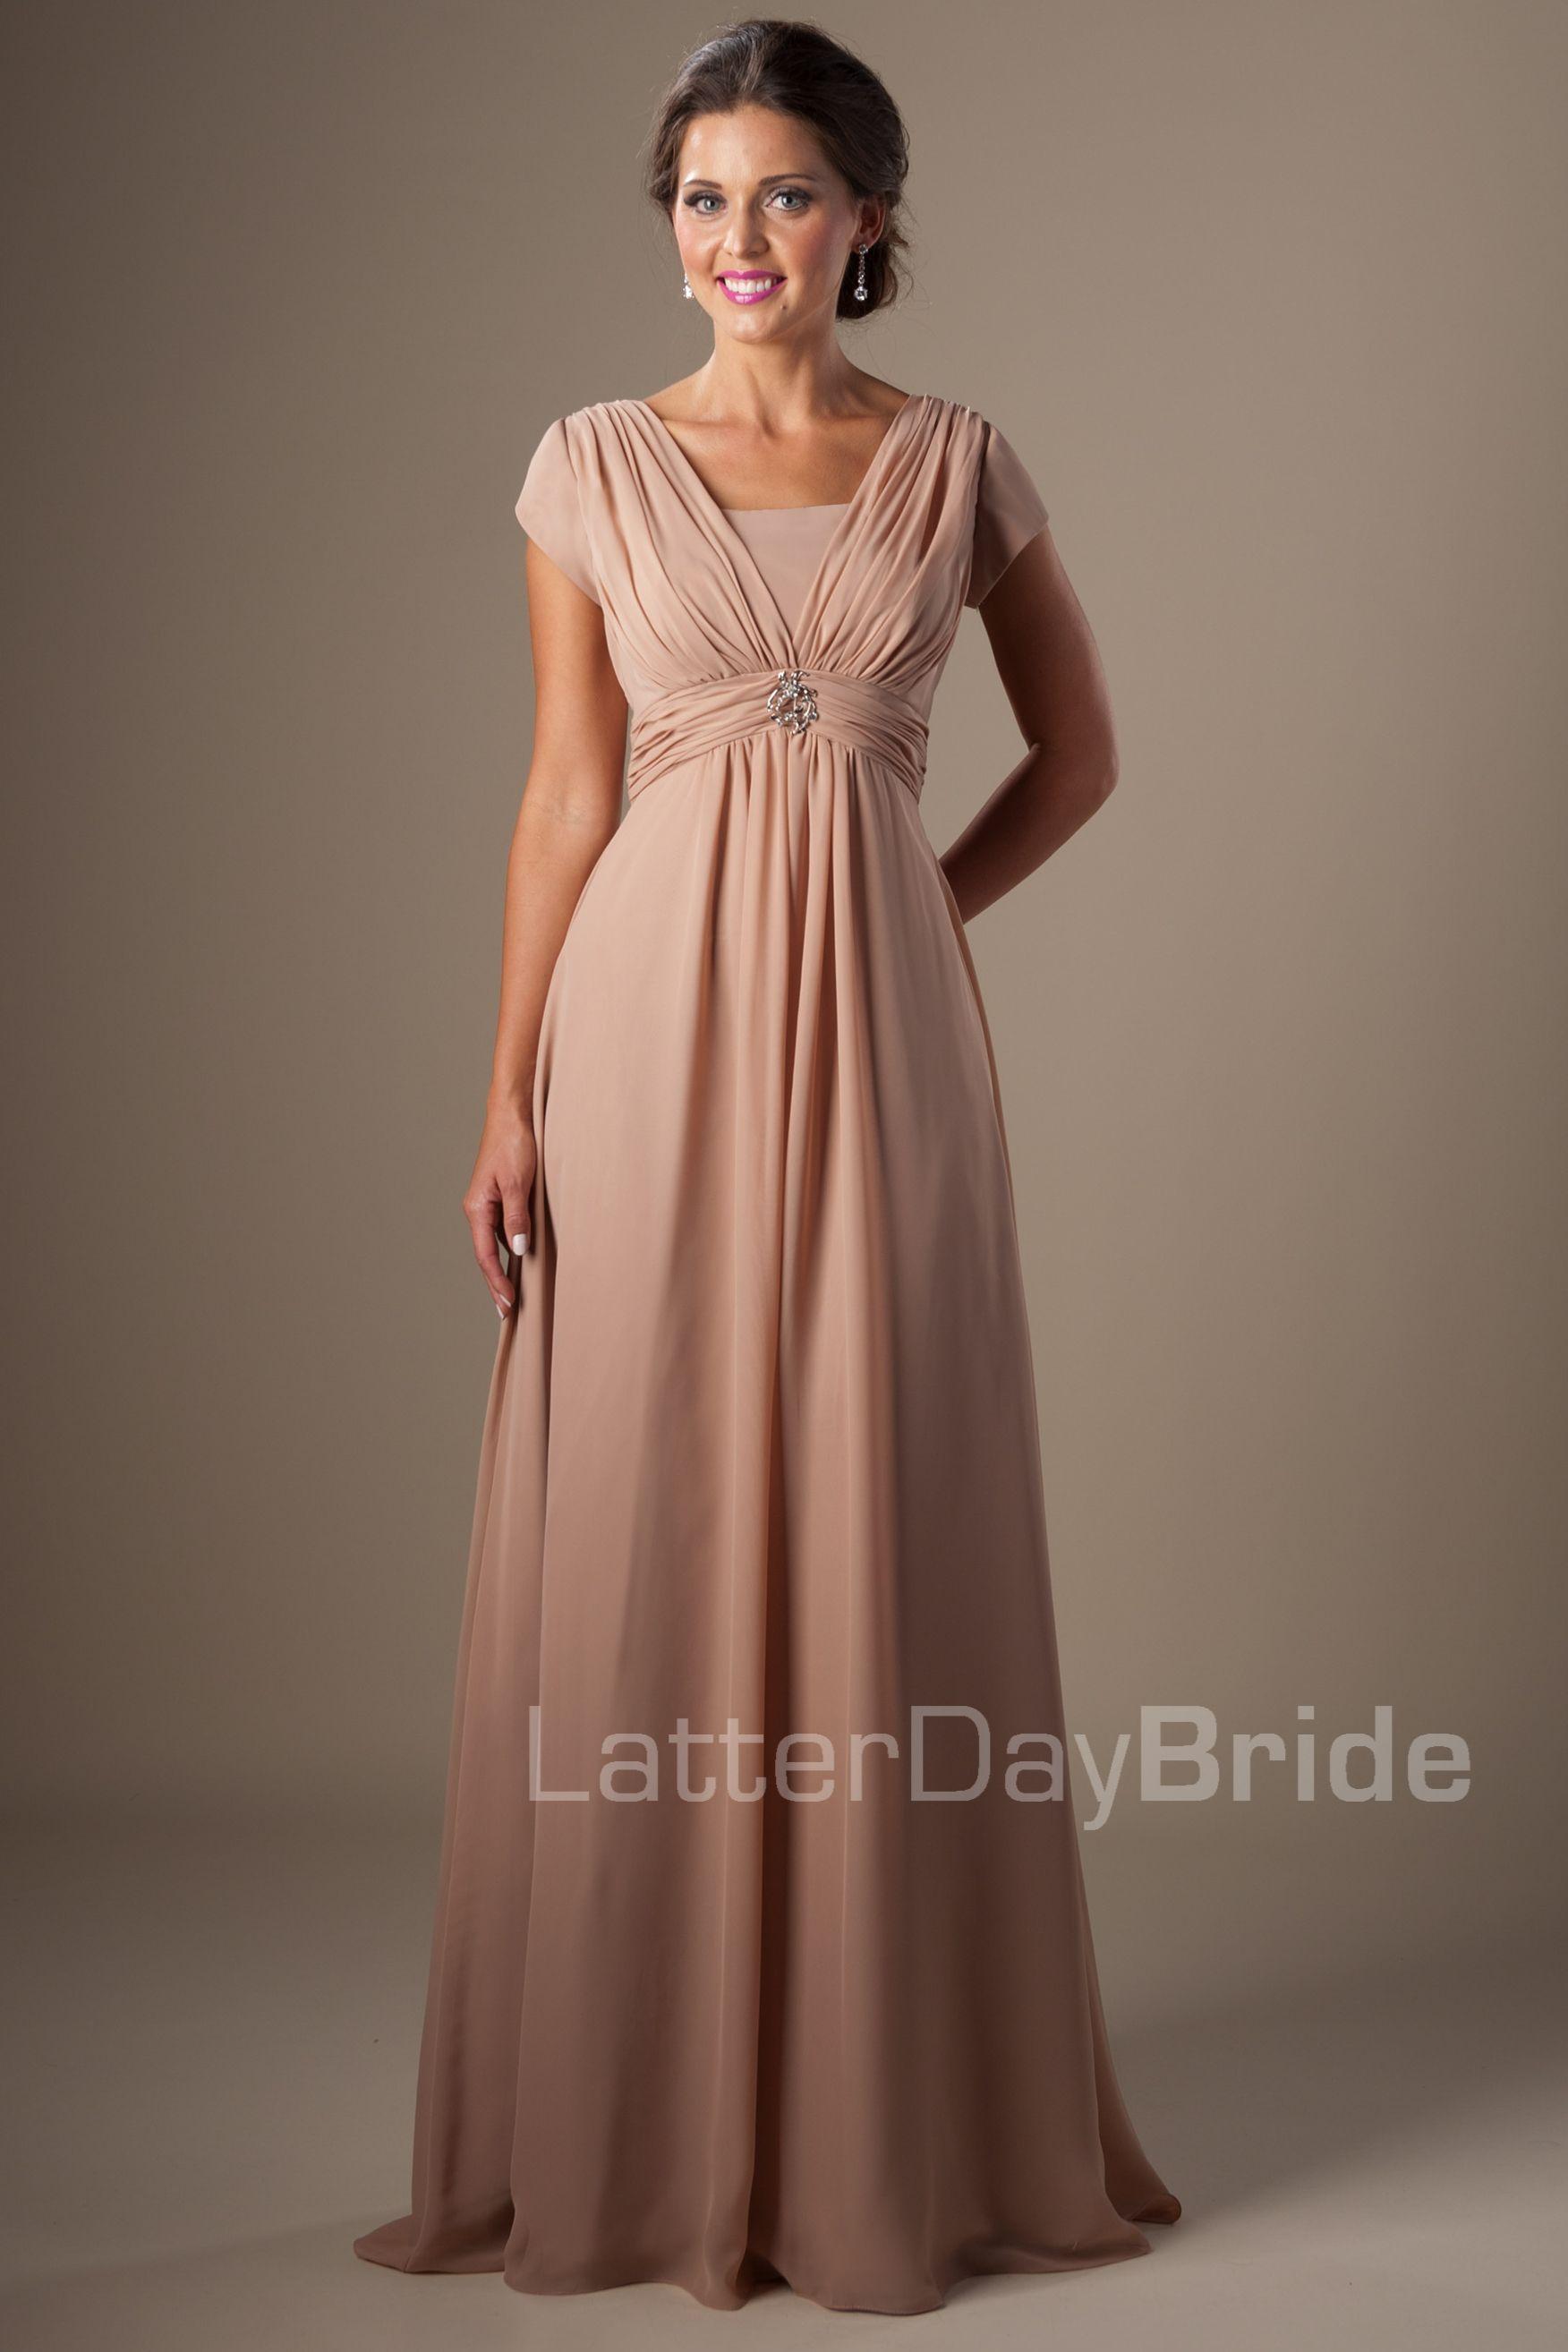 Modest Prom Dresses : Reed | Dresses | Dresses, Prom ...